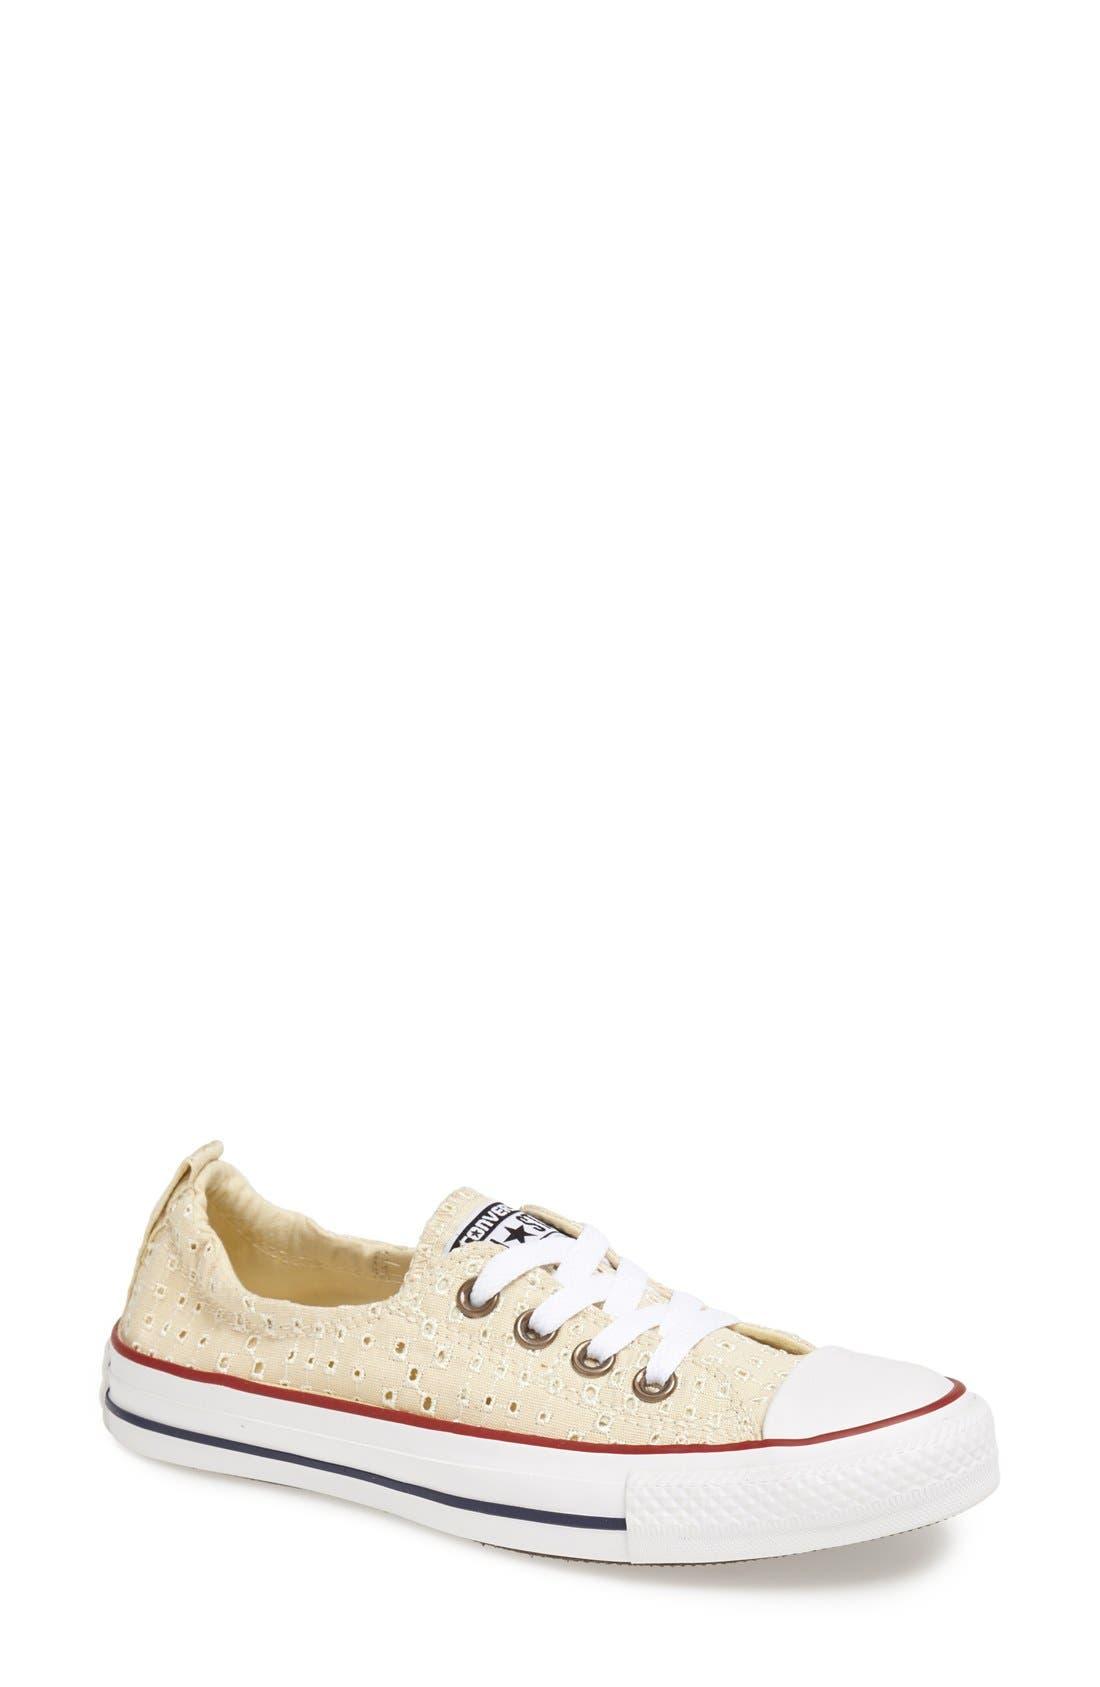 Alternate Image 1 Selected - Converse Chuck Taylor® 'Shoreline' Eyelet Sneaker (Women)